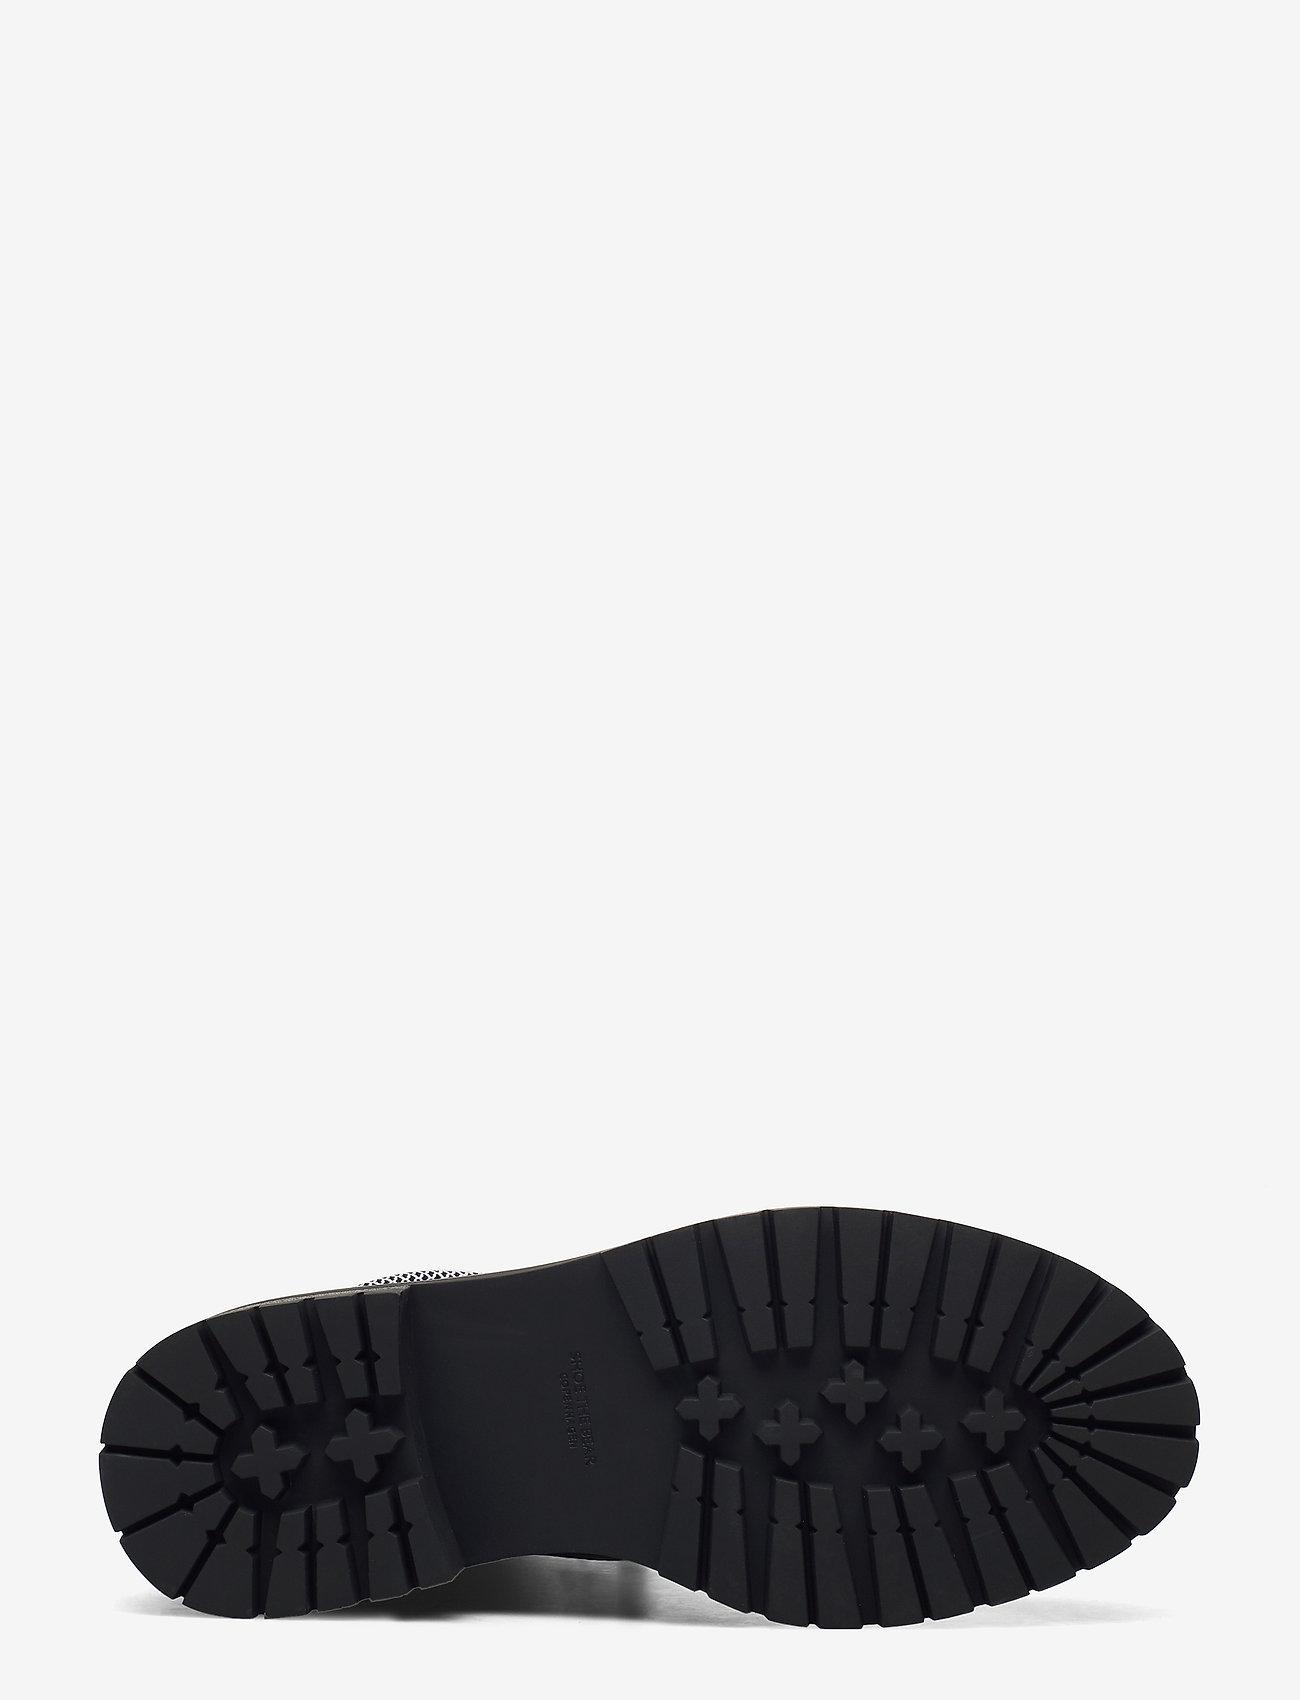 Stb-franka Lace L (Black) (132.97 €) - Shoe The Bear Laztm